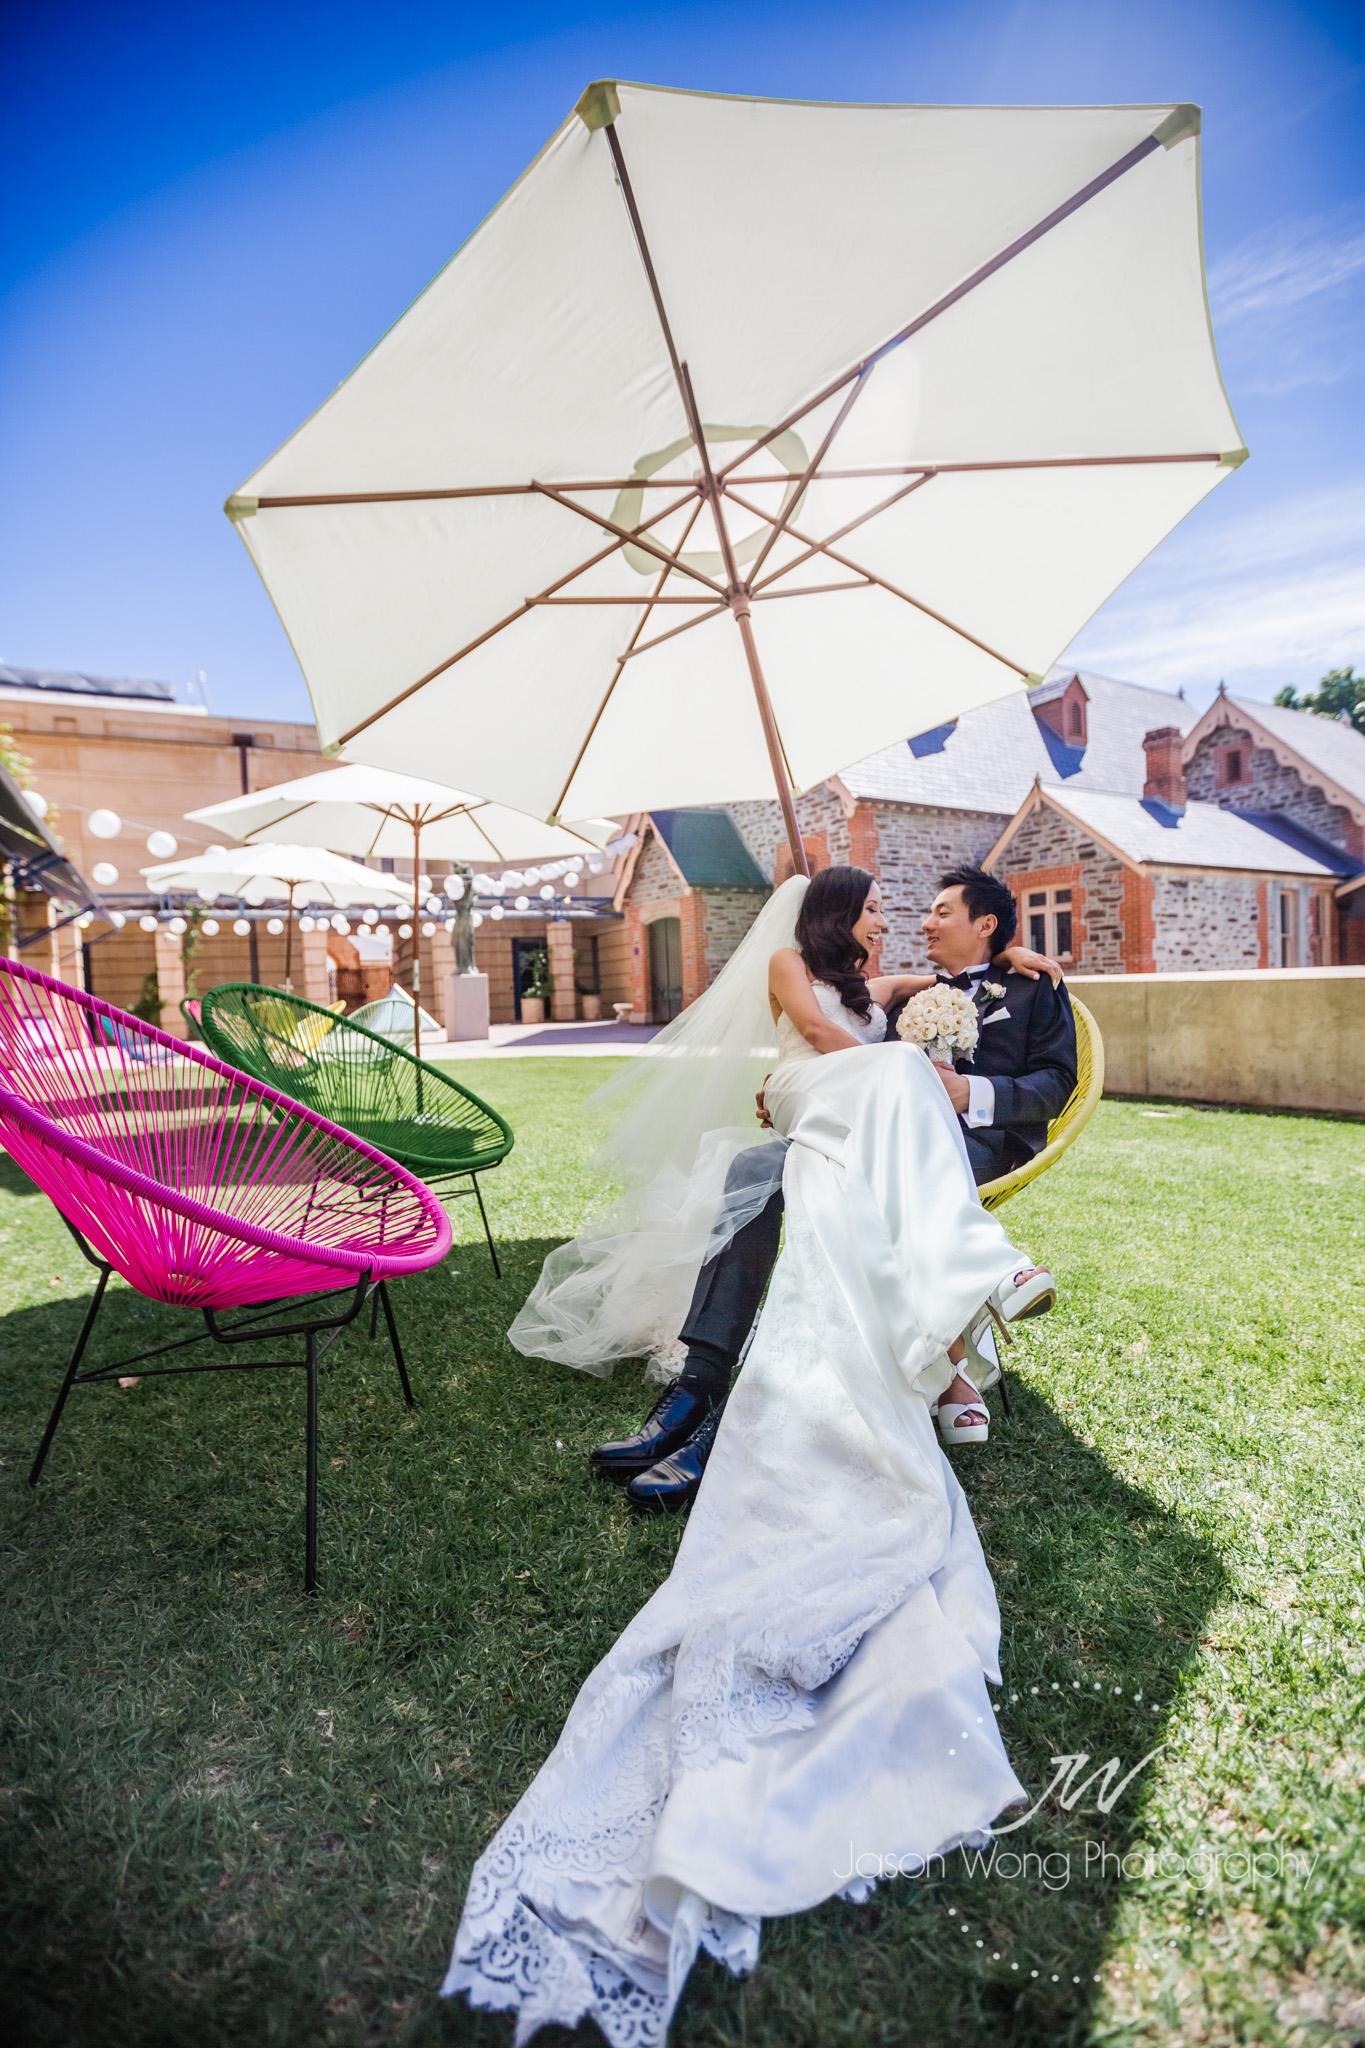 what-a-beautiful-wedding-dress.jpg